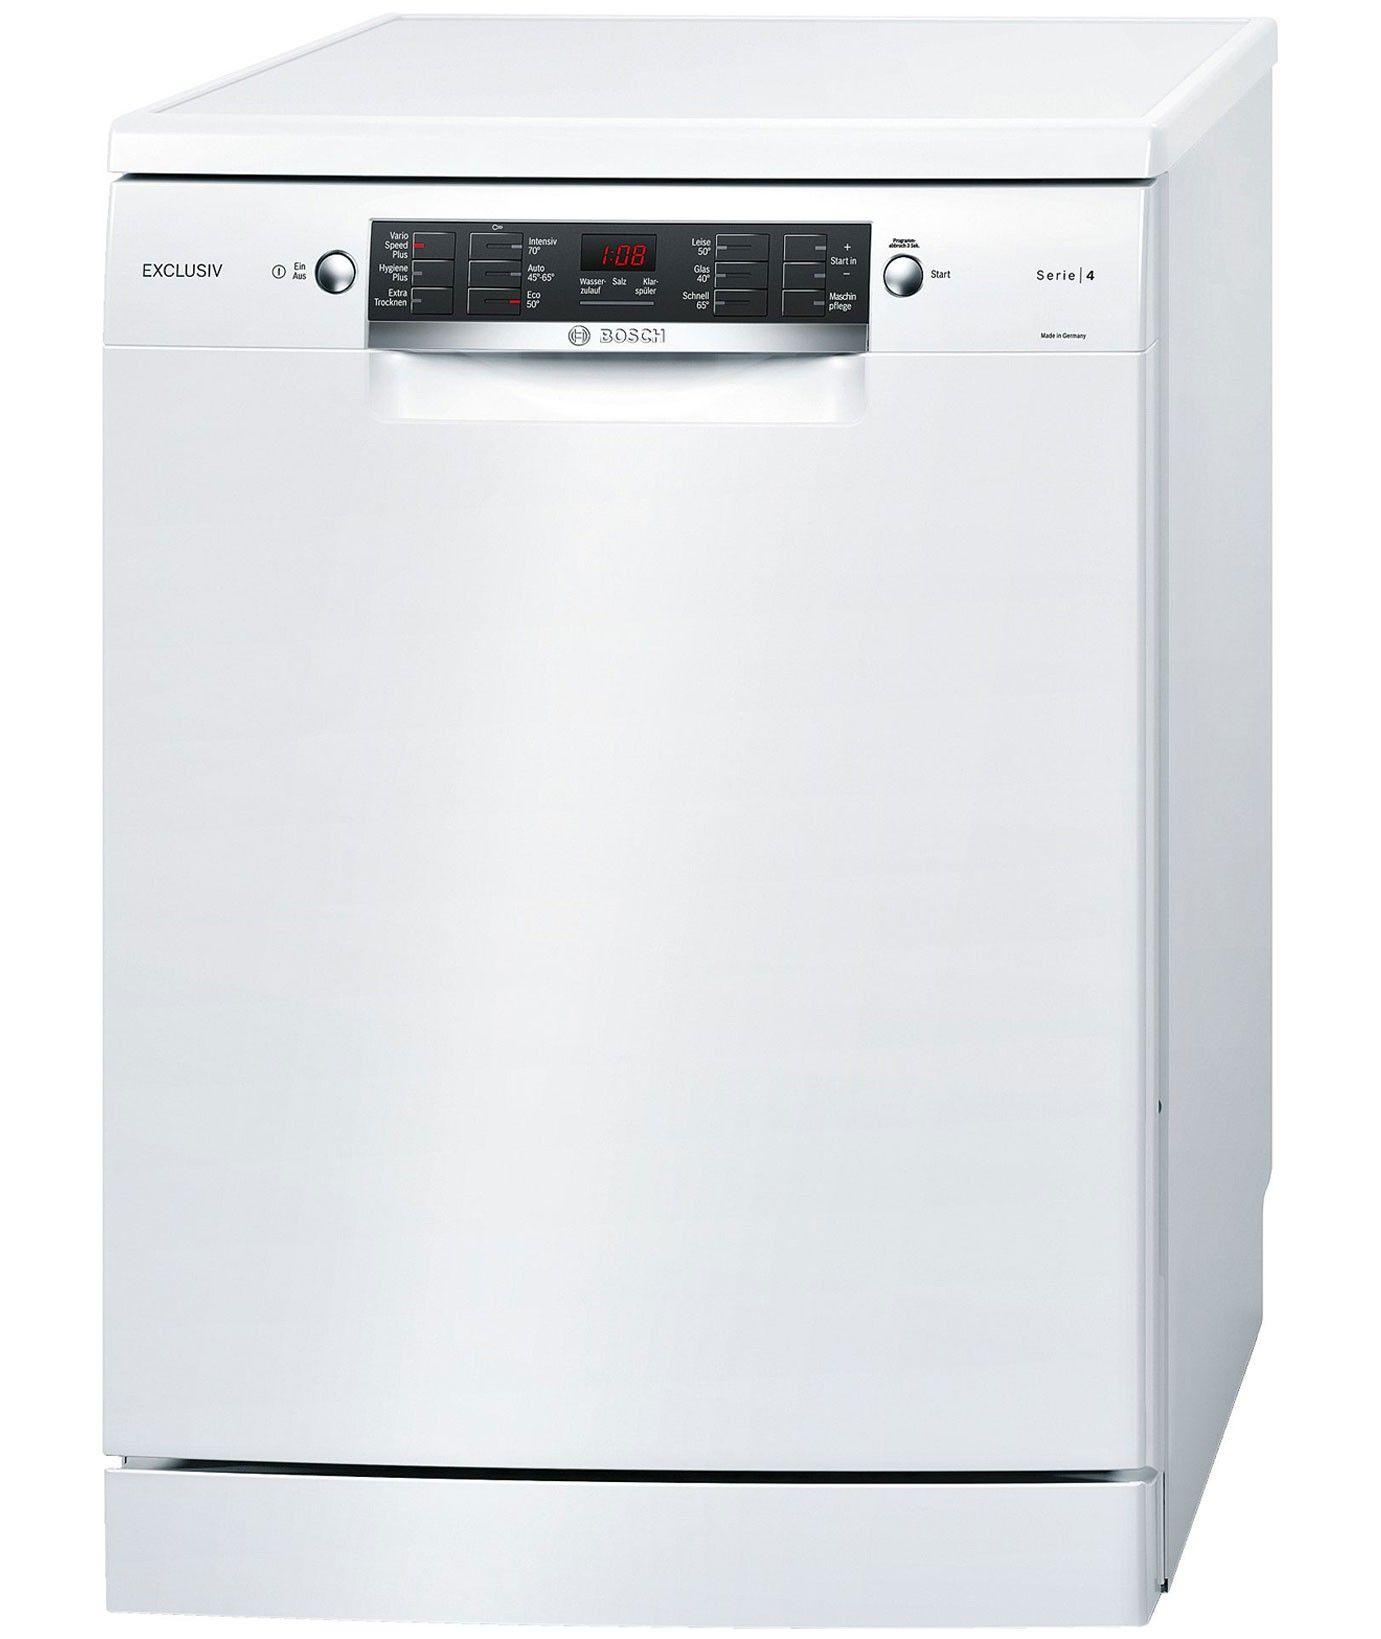 ظرفشویی بوش sms46nw01d خرید ظرفشویی بوش مدل sms46nw01d